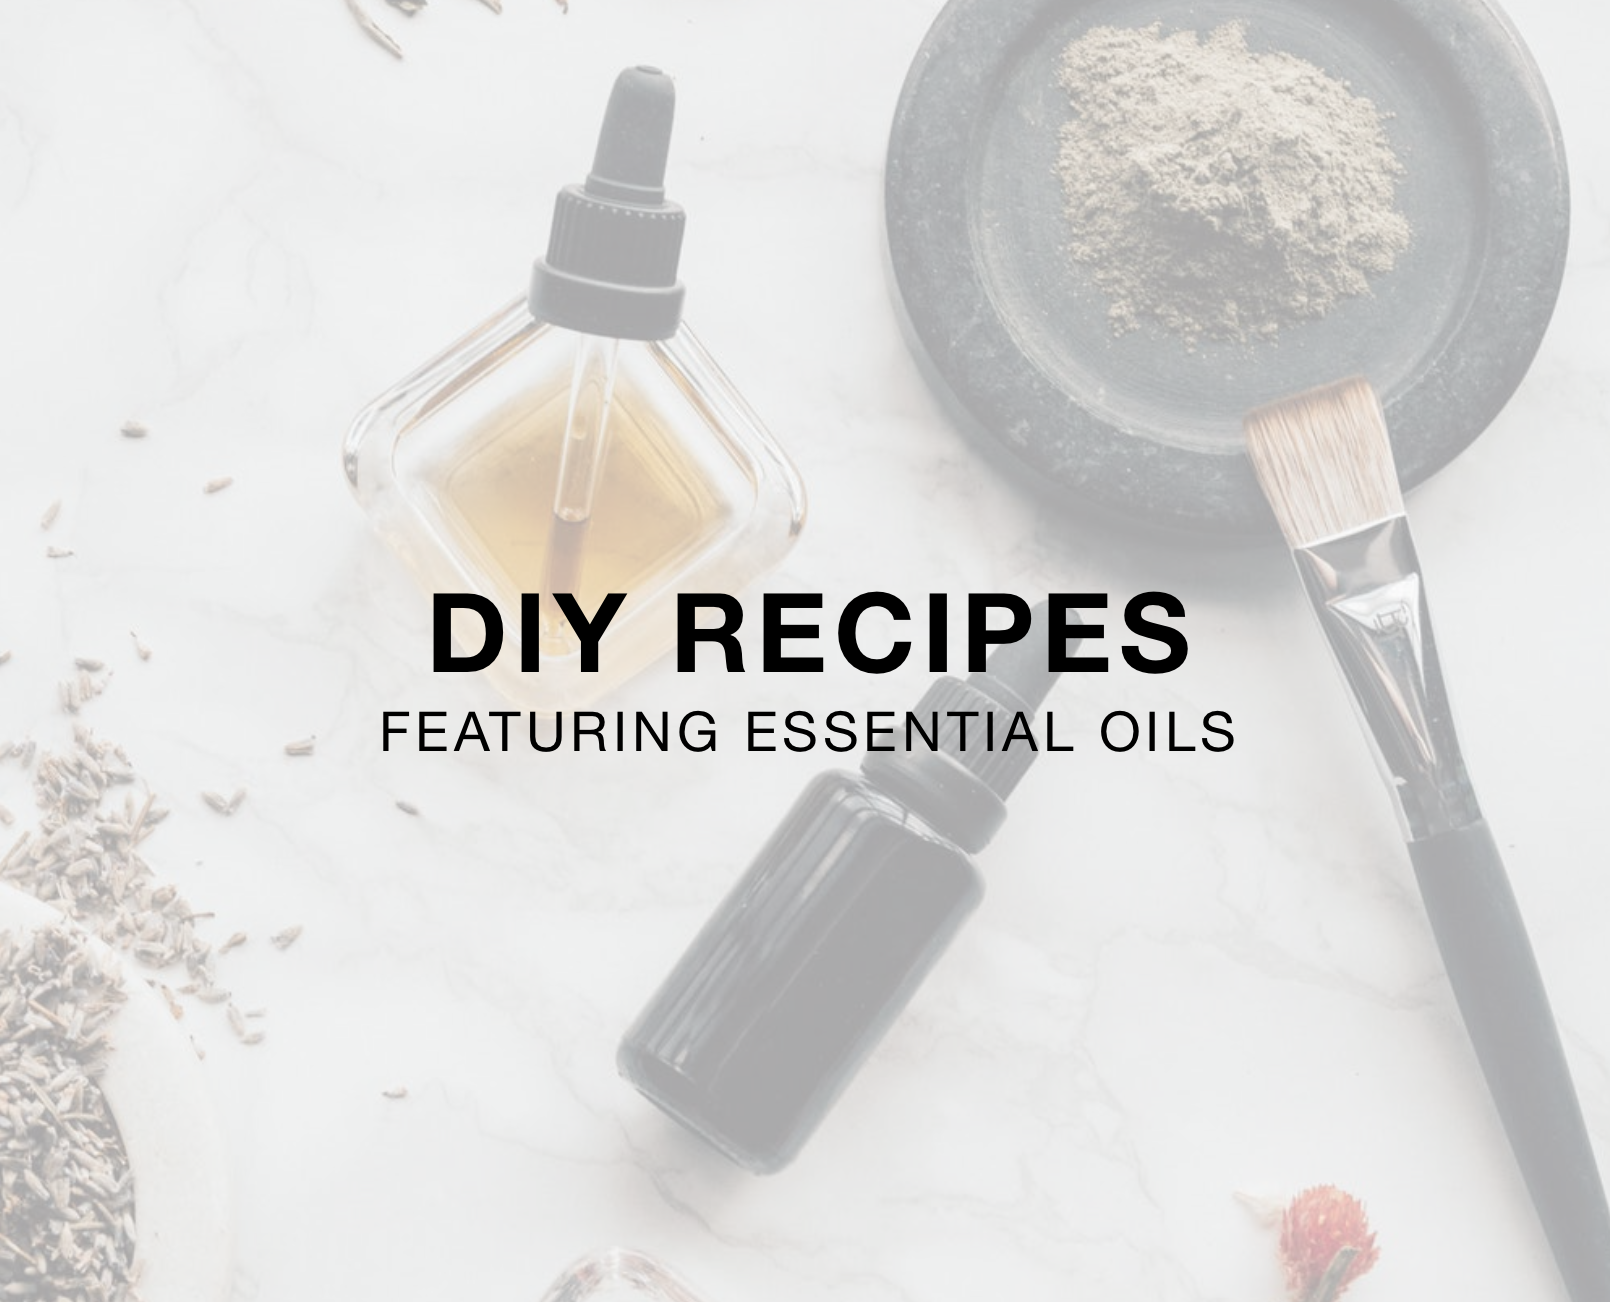 Simple + Easy Do-It-Yourself DIY Recipes Featuring dōTERRA Essential Oils